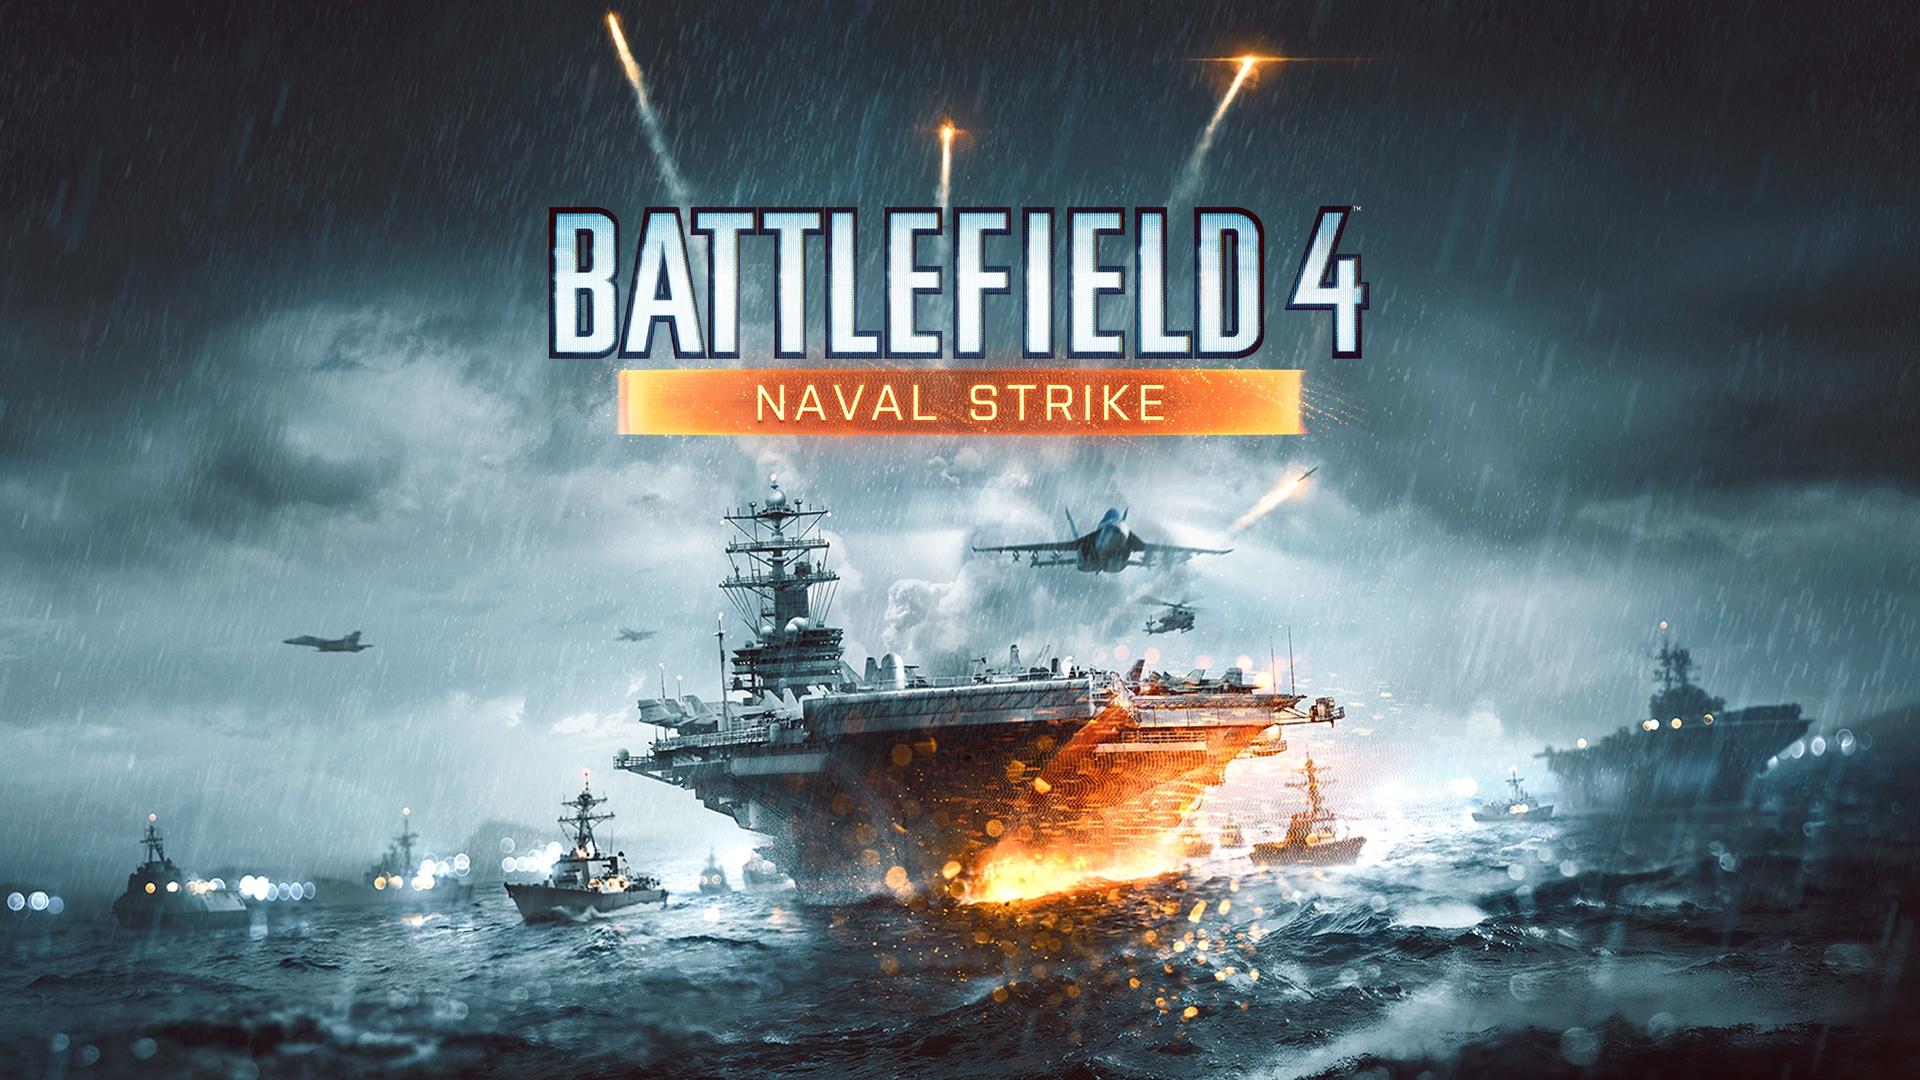 Battlefield 4 Naval Strike Wallpapers HD Wallpapers 1920x1080